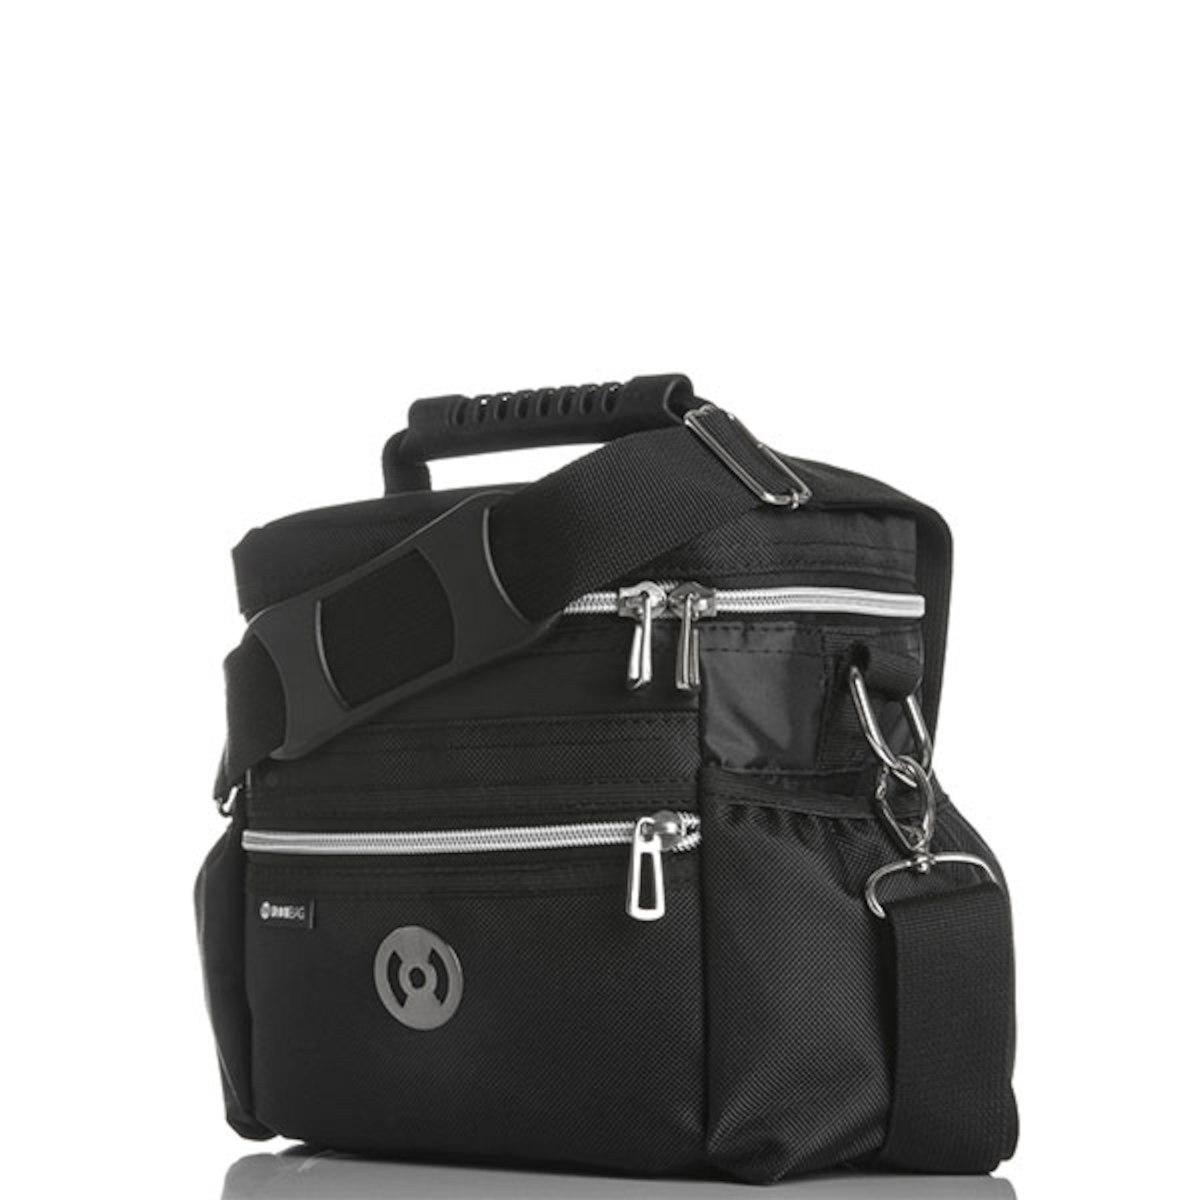 35bb2acd8 Bolsa Térmica Iron Bag Mini Pop Preta - Bolsa Térmica Fitness